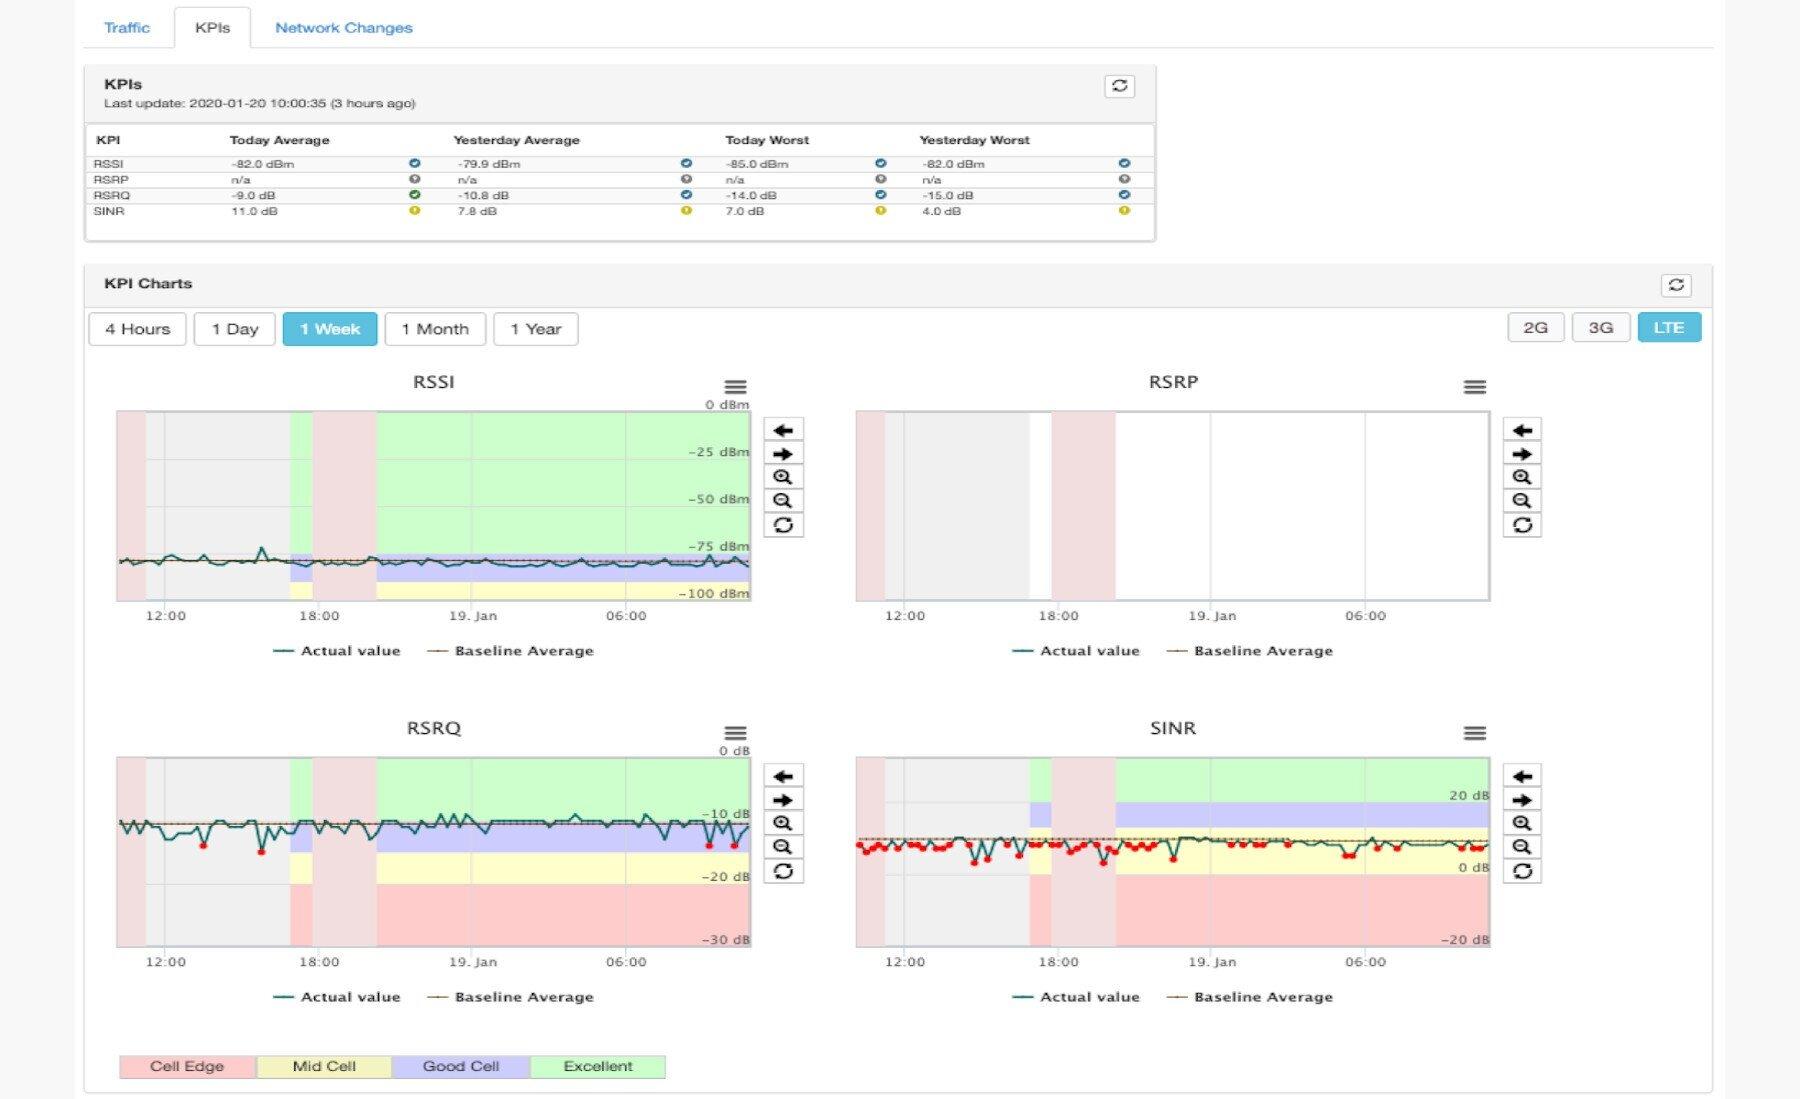 LTE-KPIs.jpg